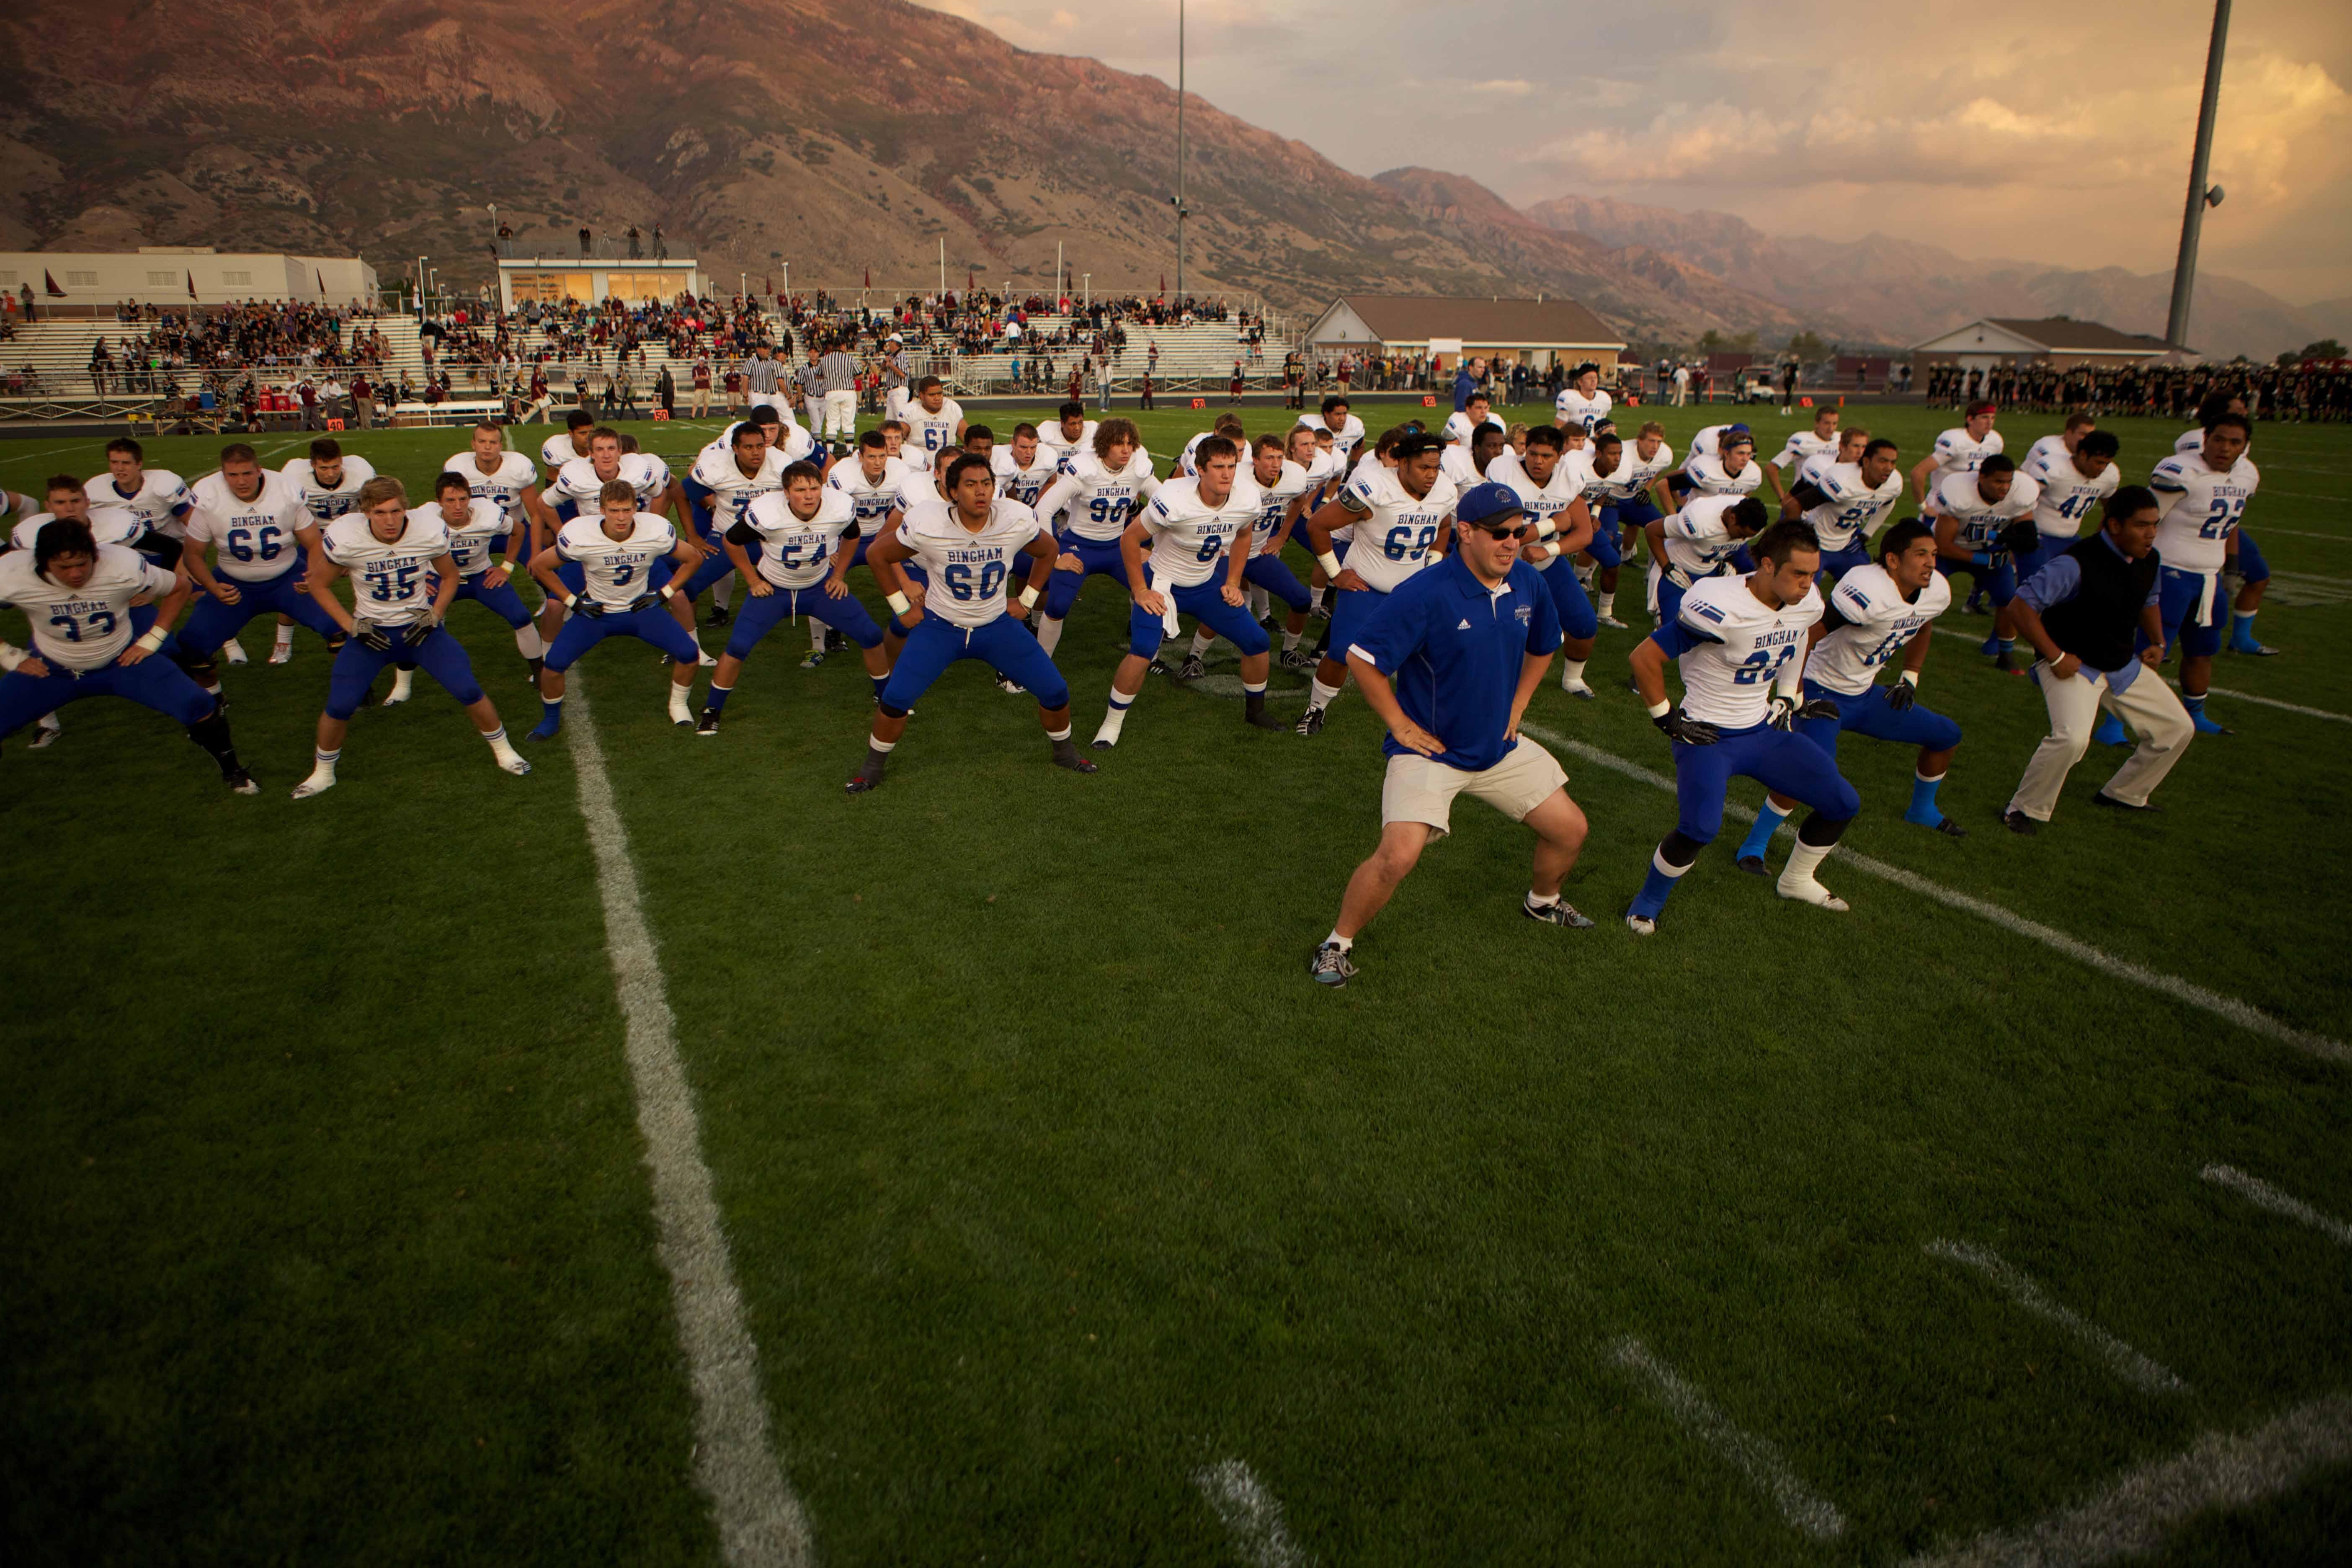 The Bingham football team performs their pre-game ritual, the haka.